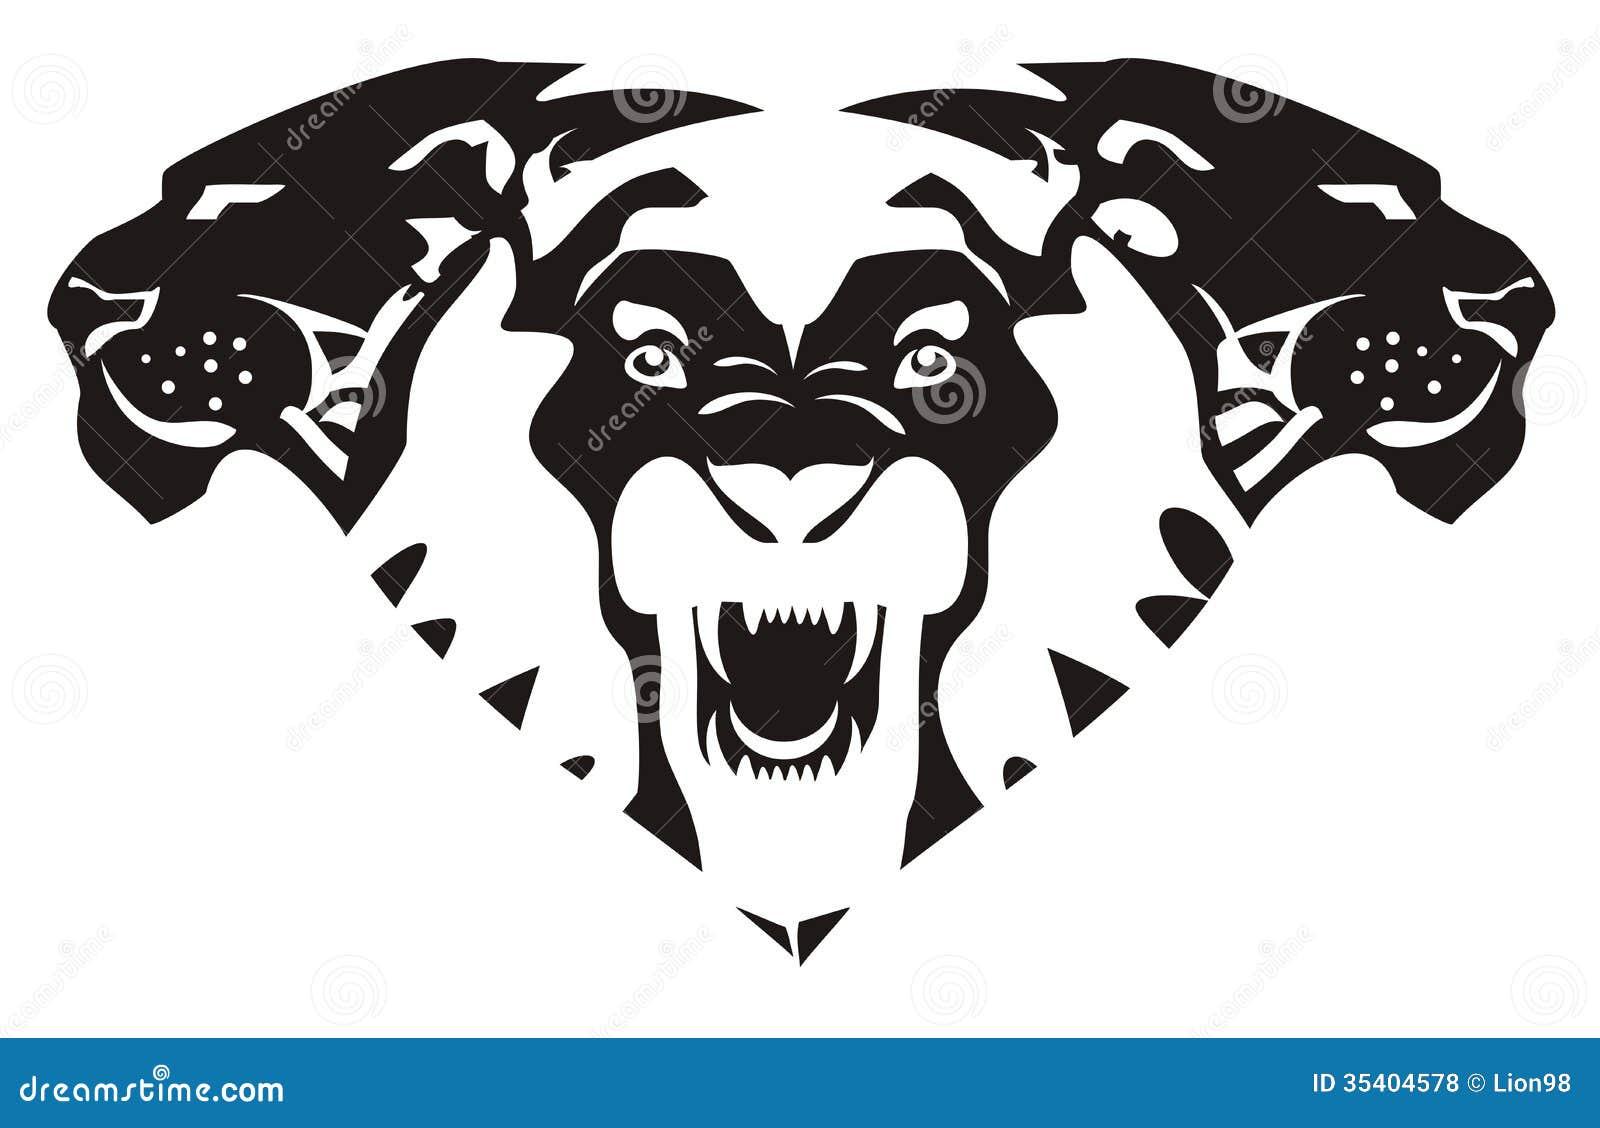 Lion Emblem Royalty Free Stock Photos Image 35404578